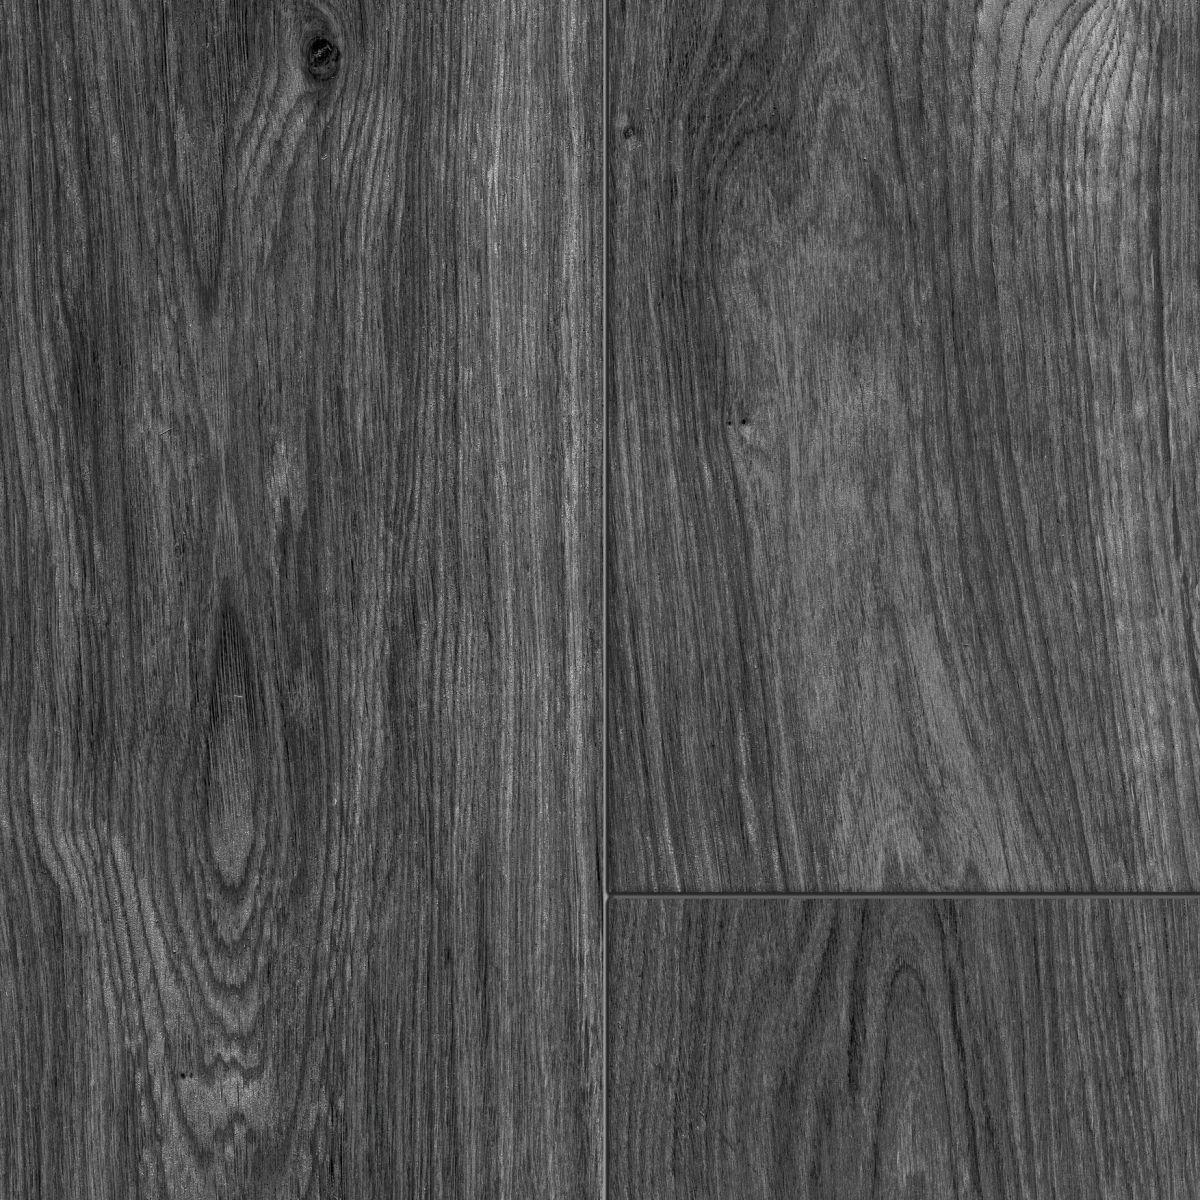 Avatara vloerdelen hout N10 detail